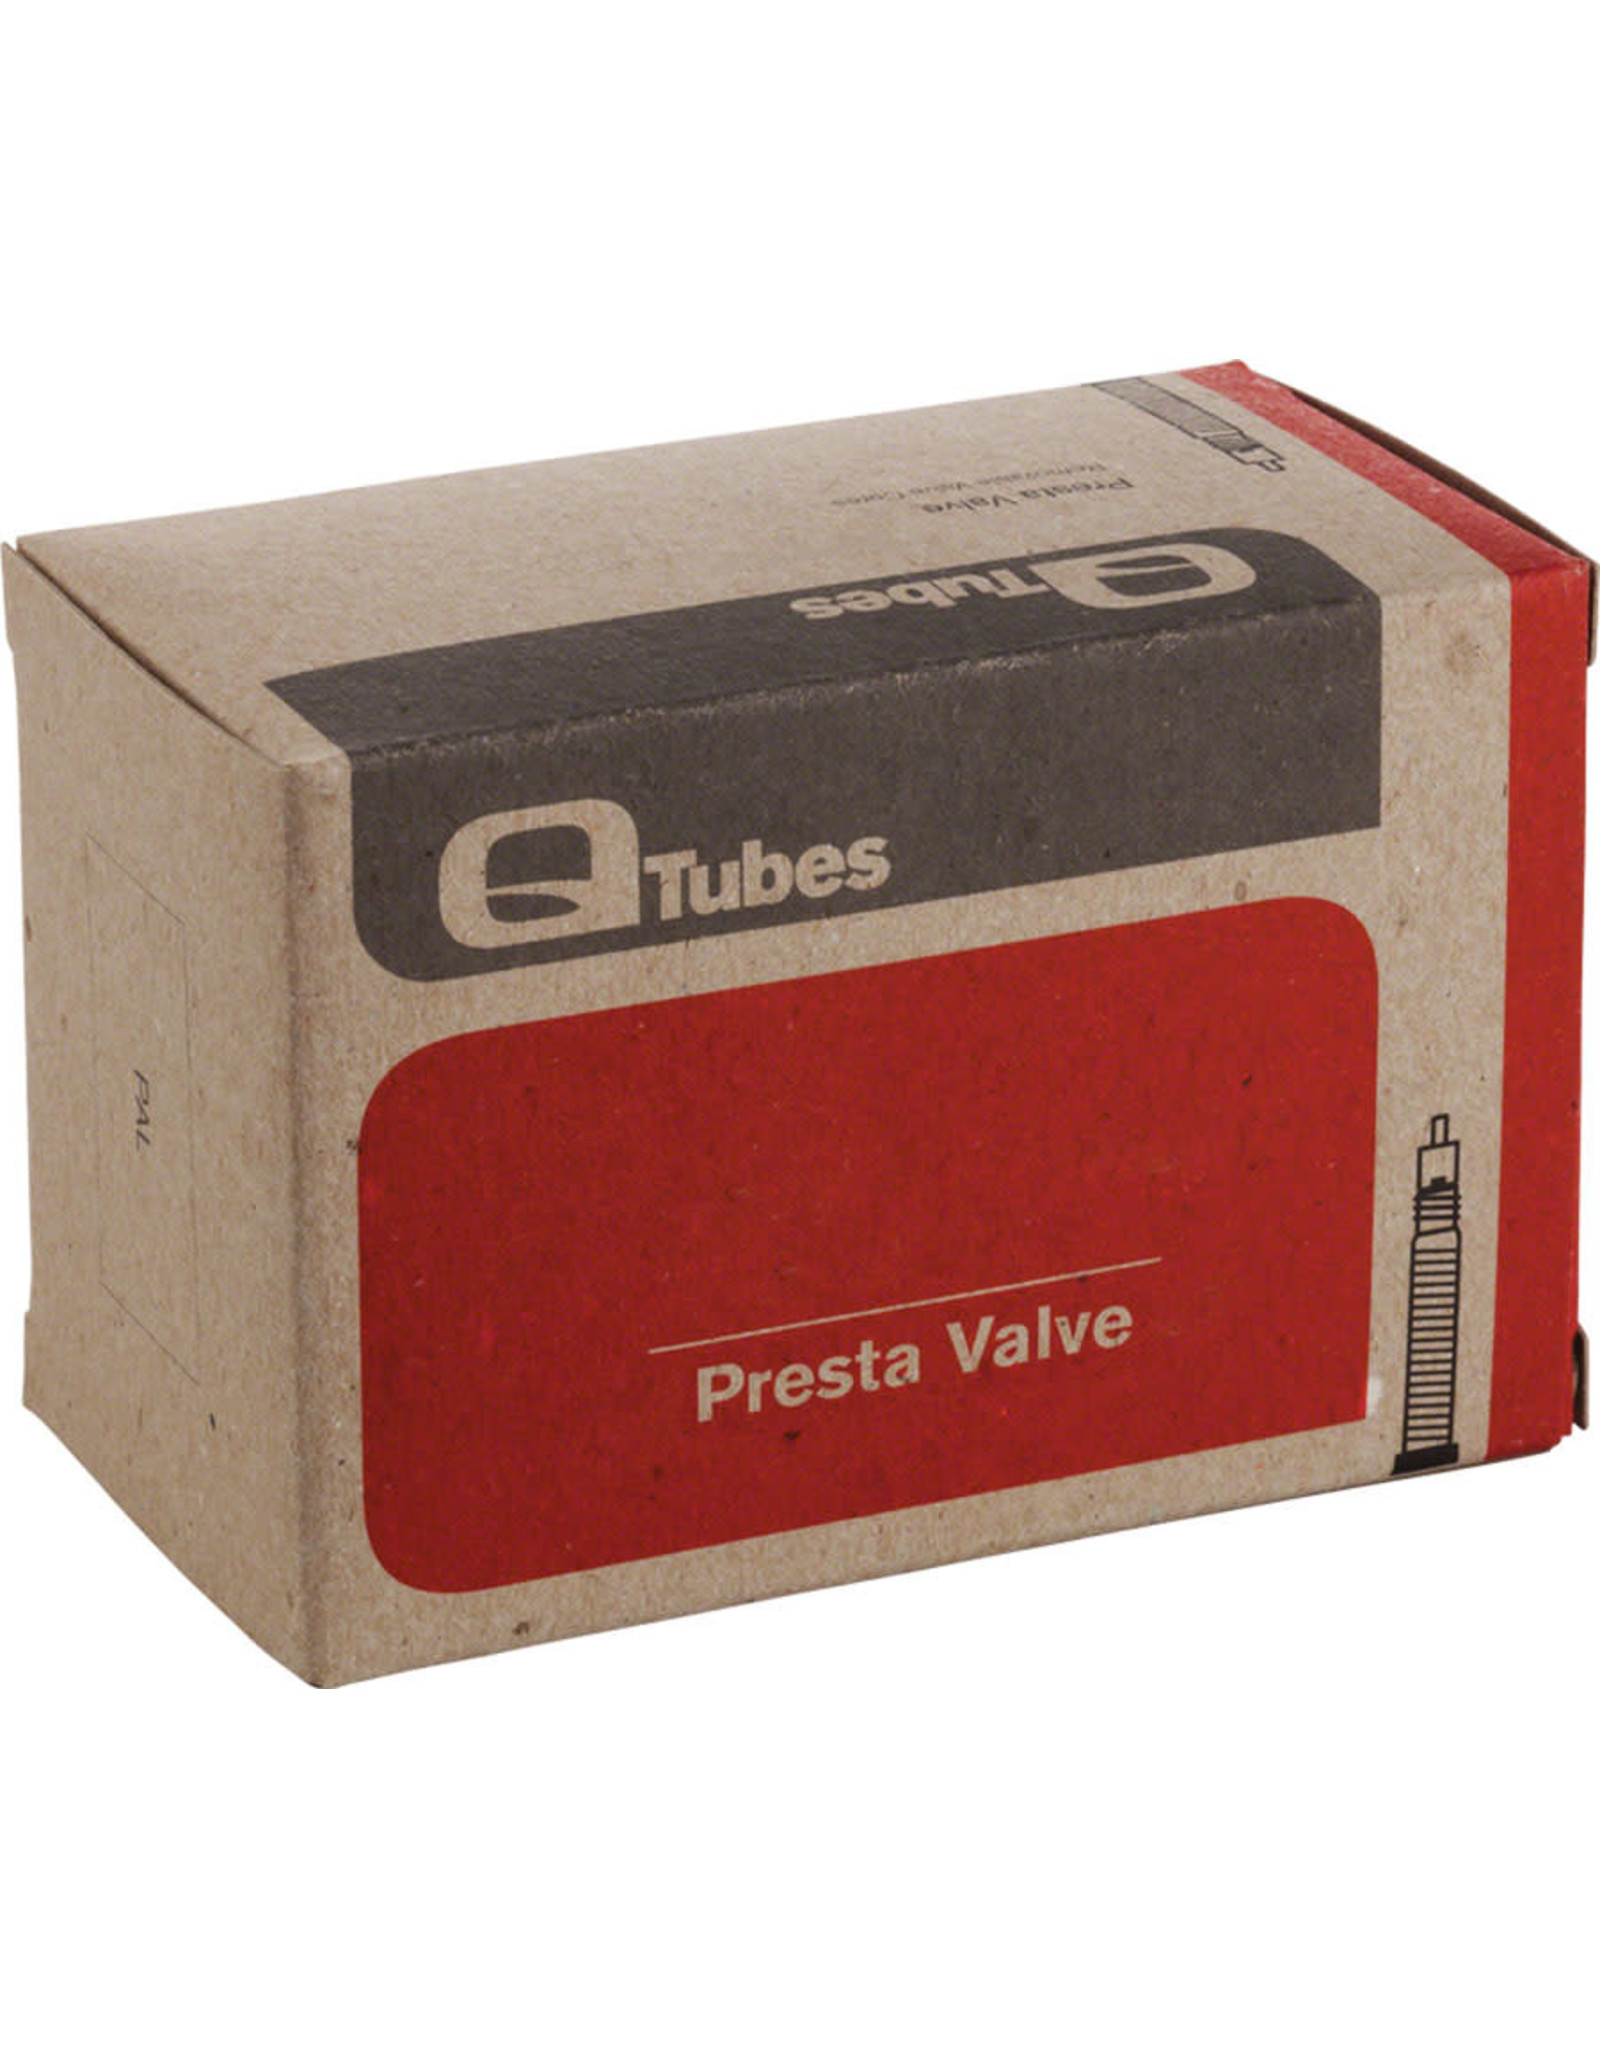 Q-Tubes Q-Tubes Superlight 700c x 23-25mm 80mm Presta Valve Tube